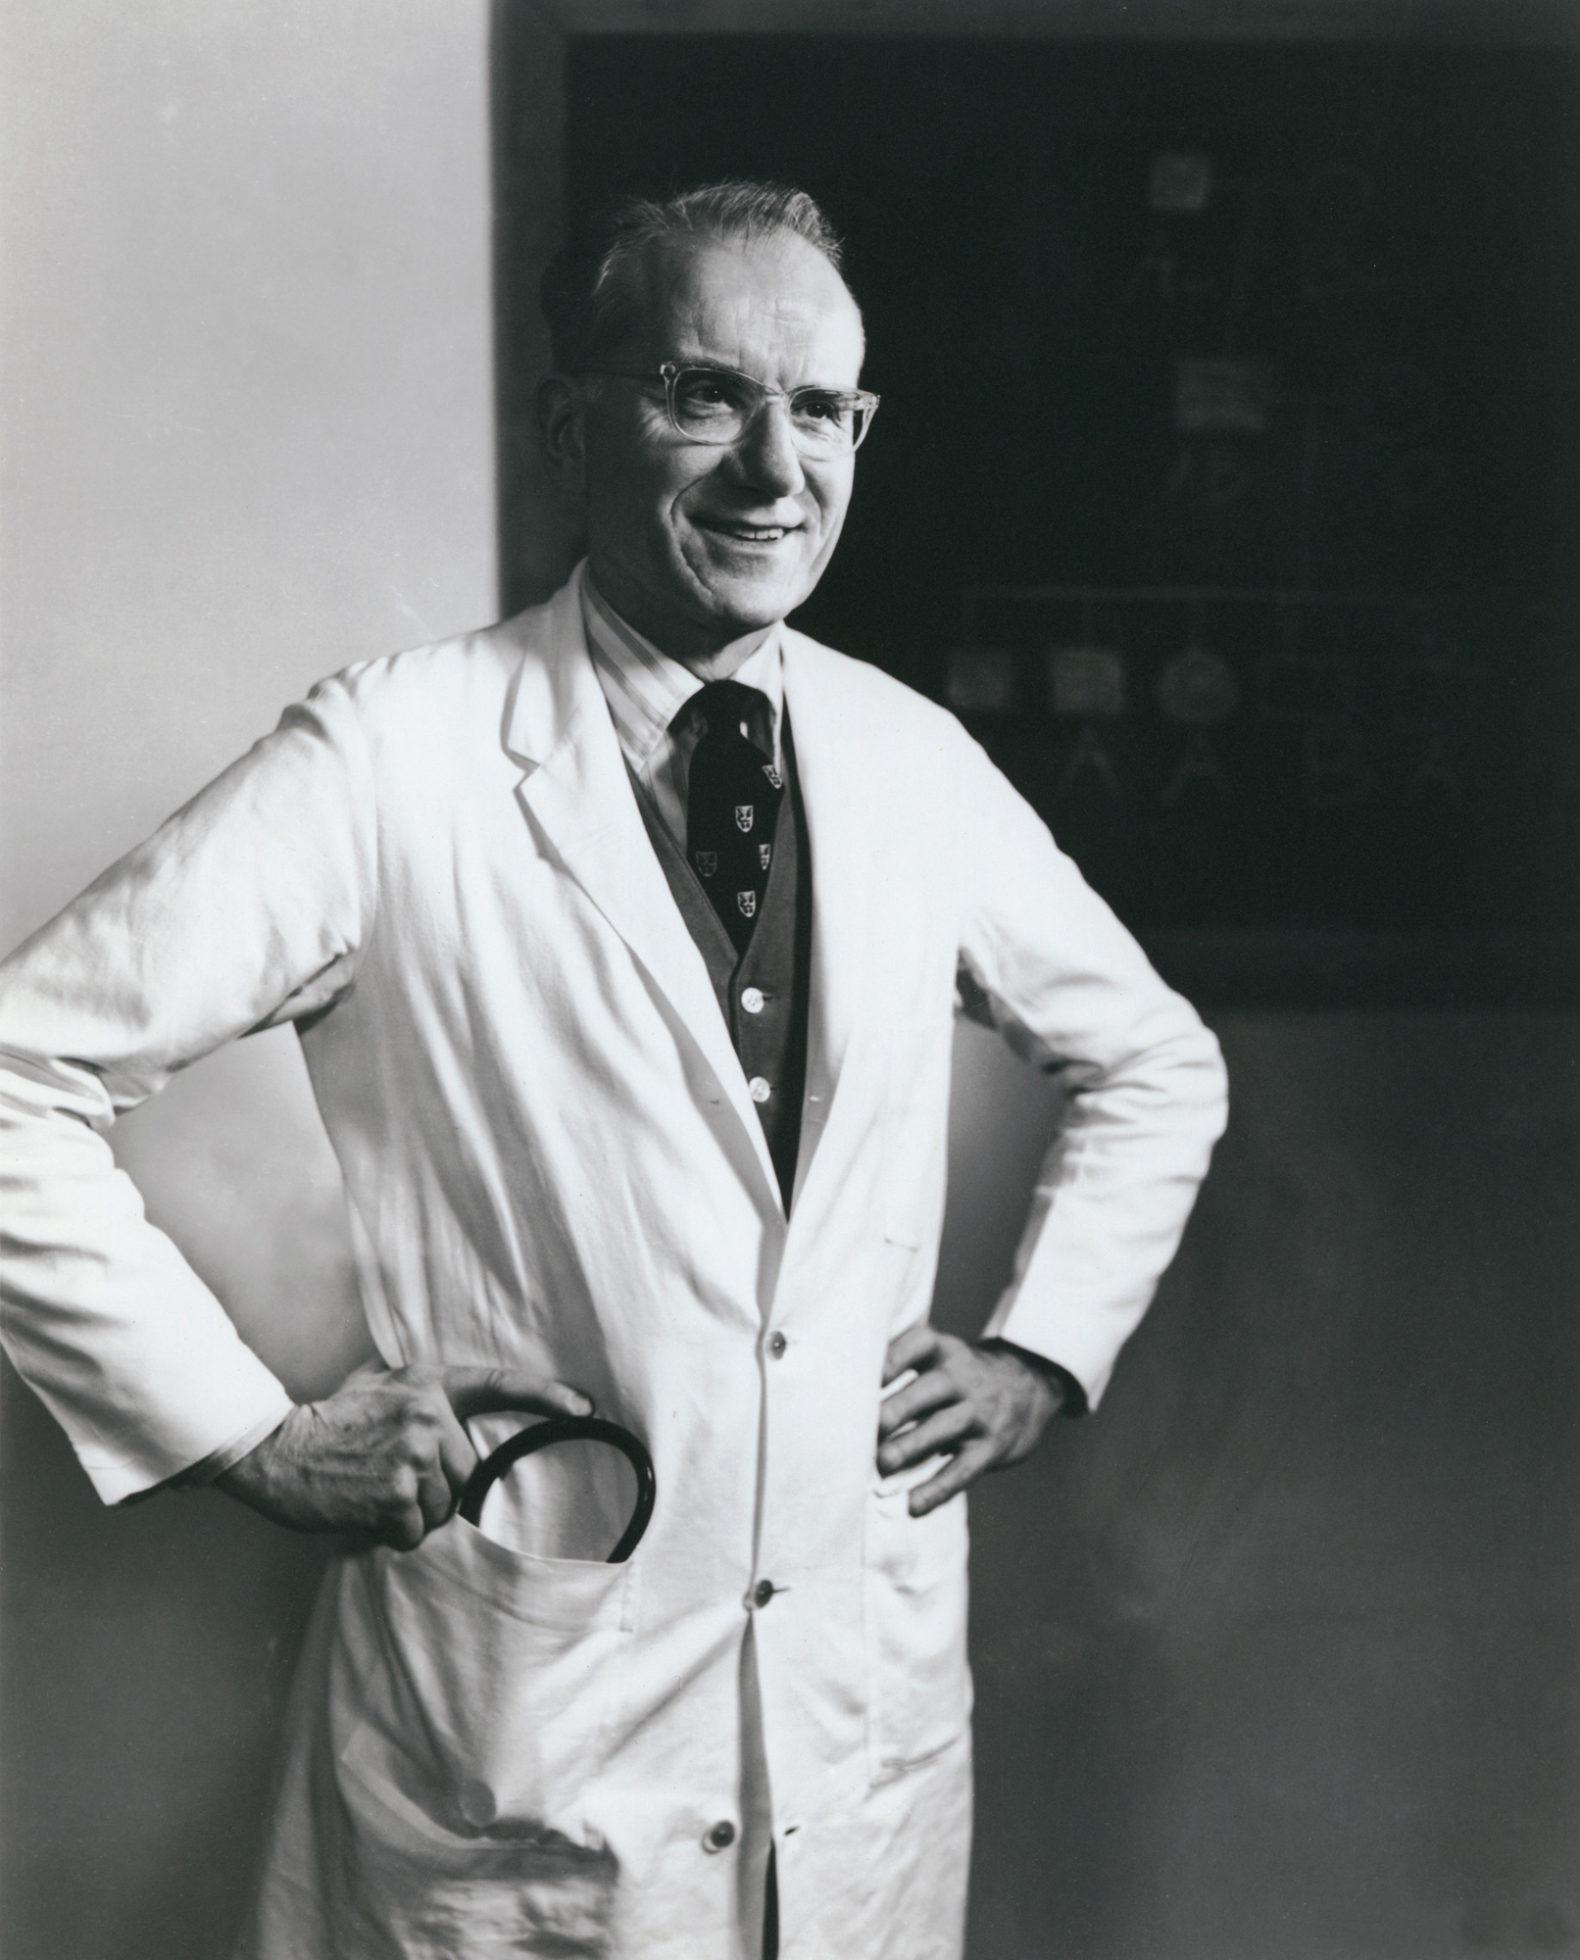 Dr. Victor McKusick